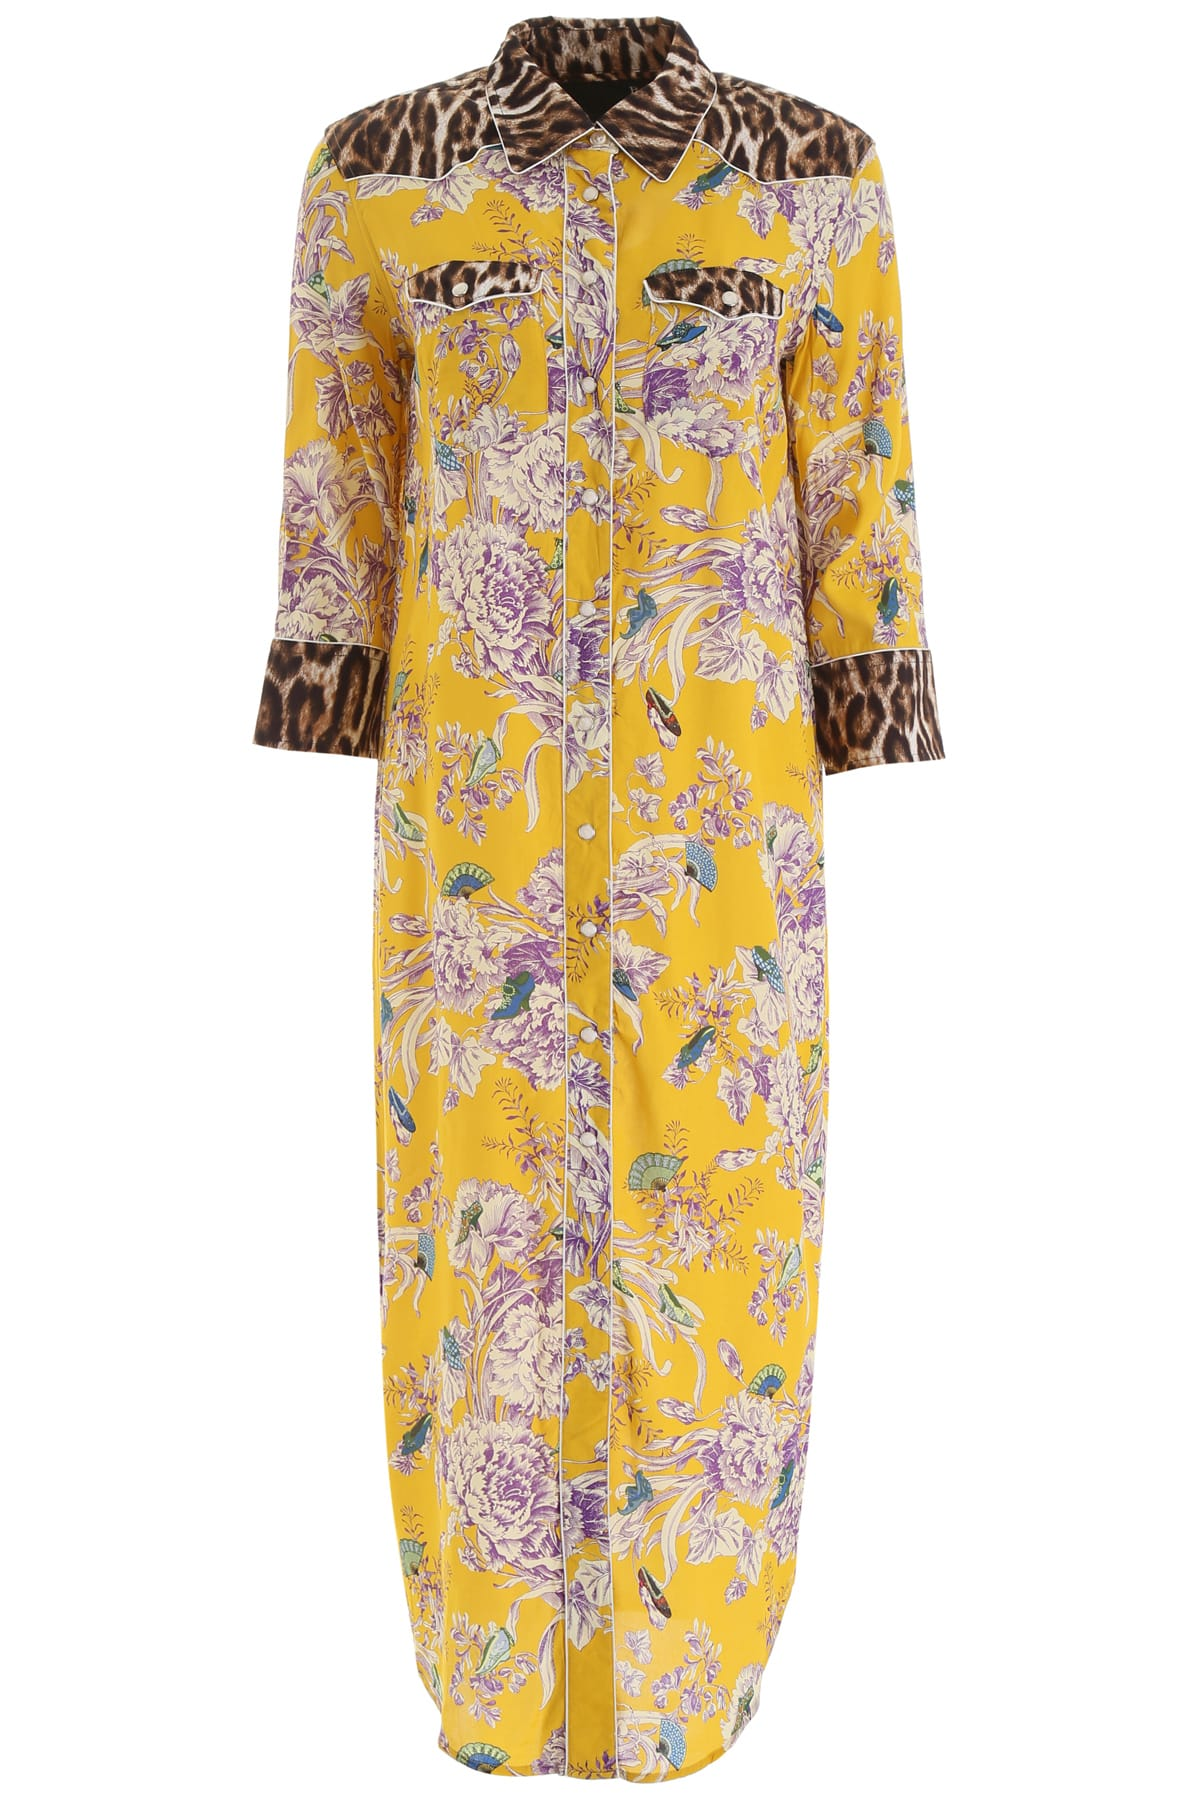 R13 Floral Western Dress